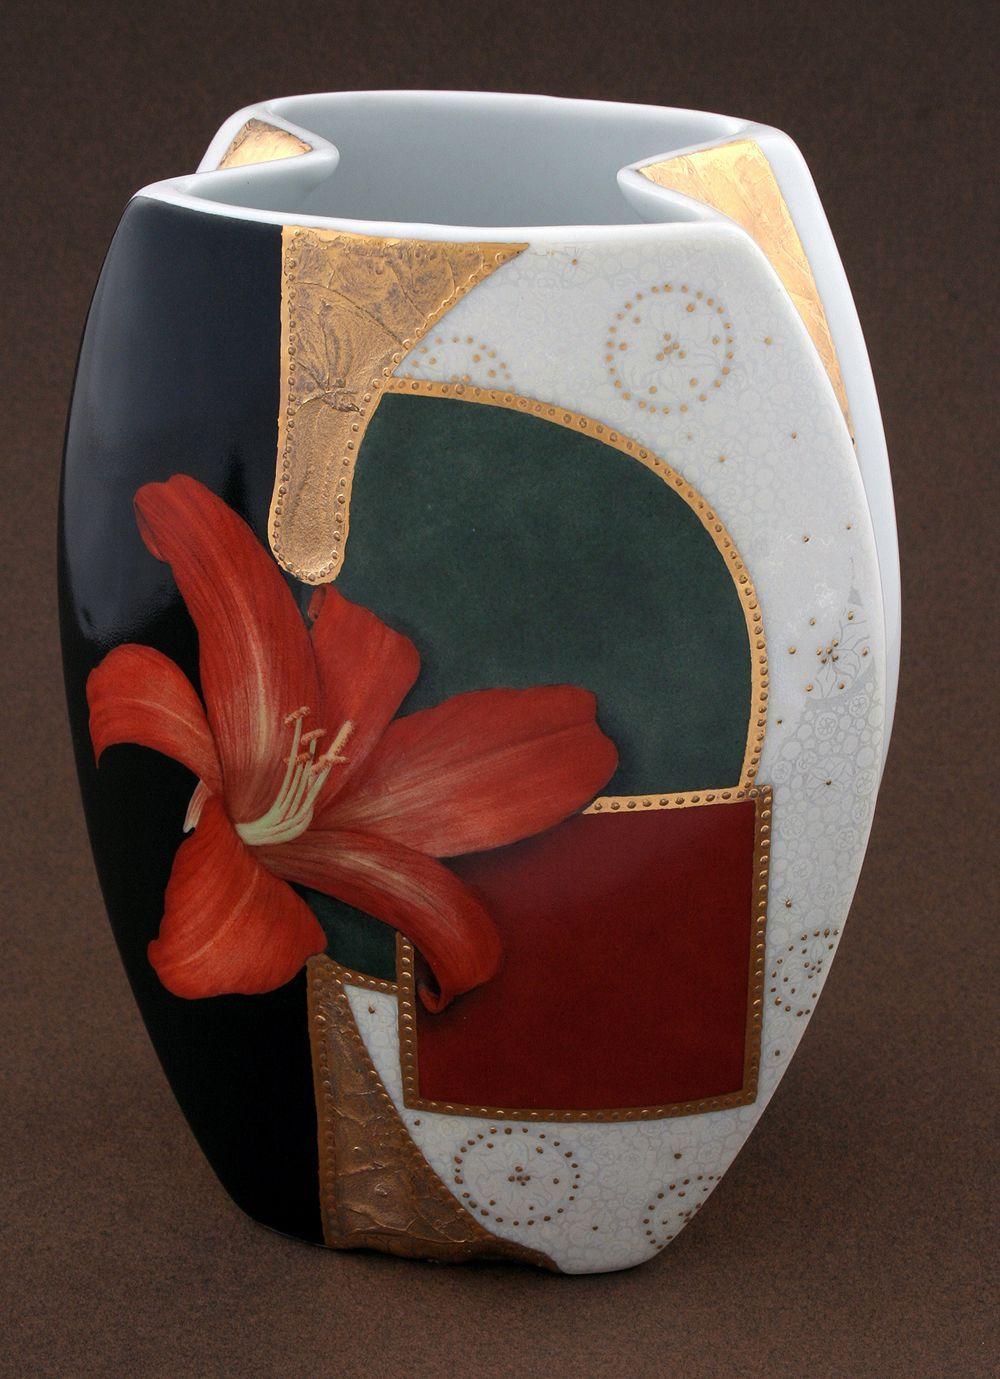 Prodigious ideas handmade wooden vases blown glass vases vases art shape vases interior centerpieces ceramic vases makeover